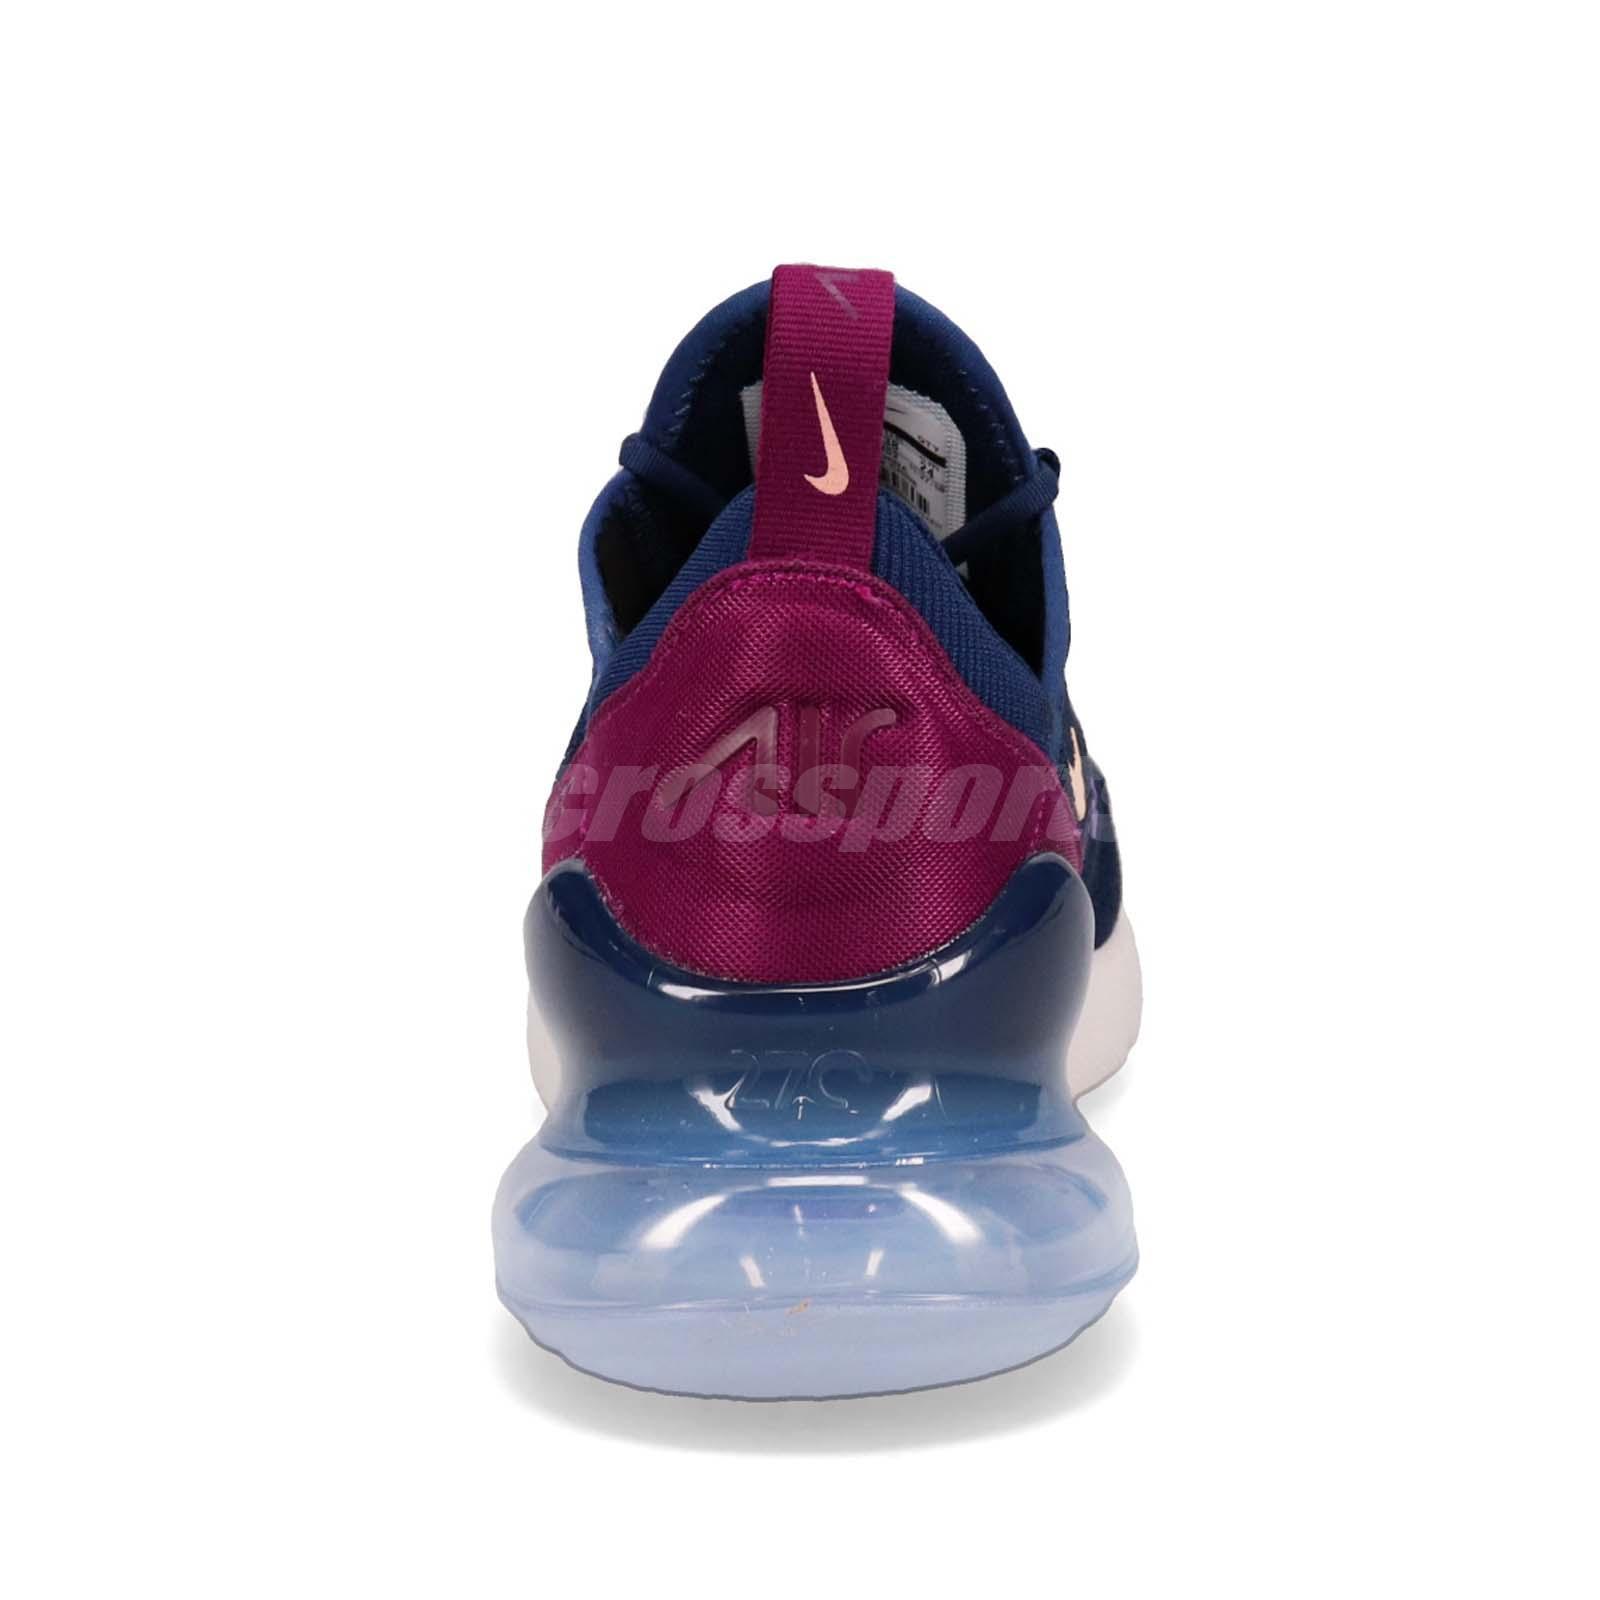 70b5898c5 Nike Wmns Air Max 270 Blue Void Crimson Tint Women Running Shoes ...